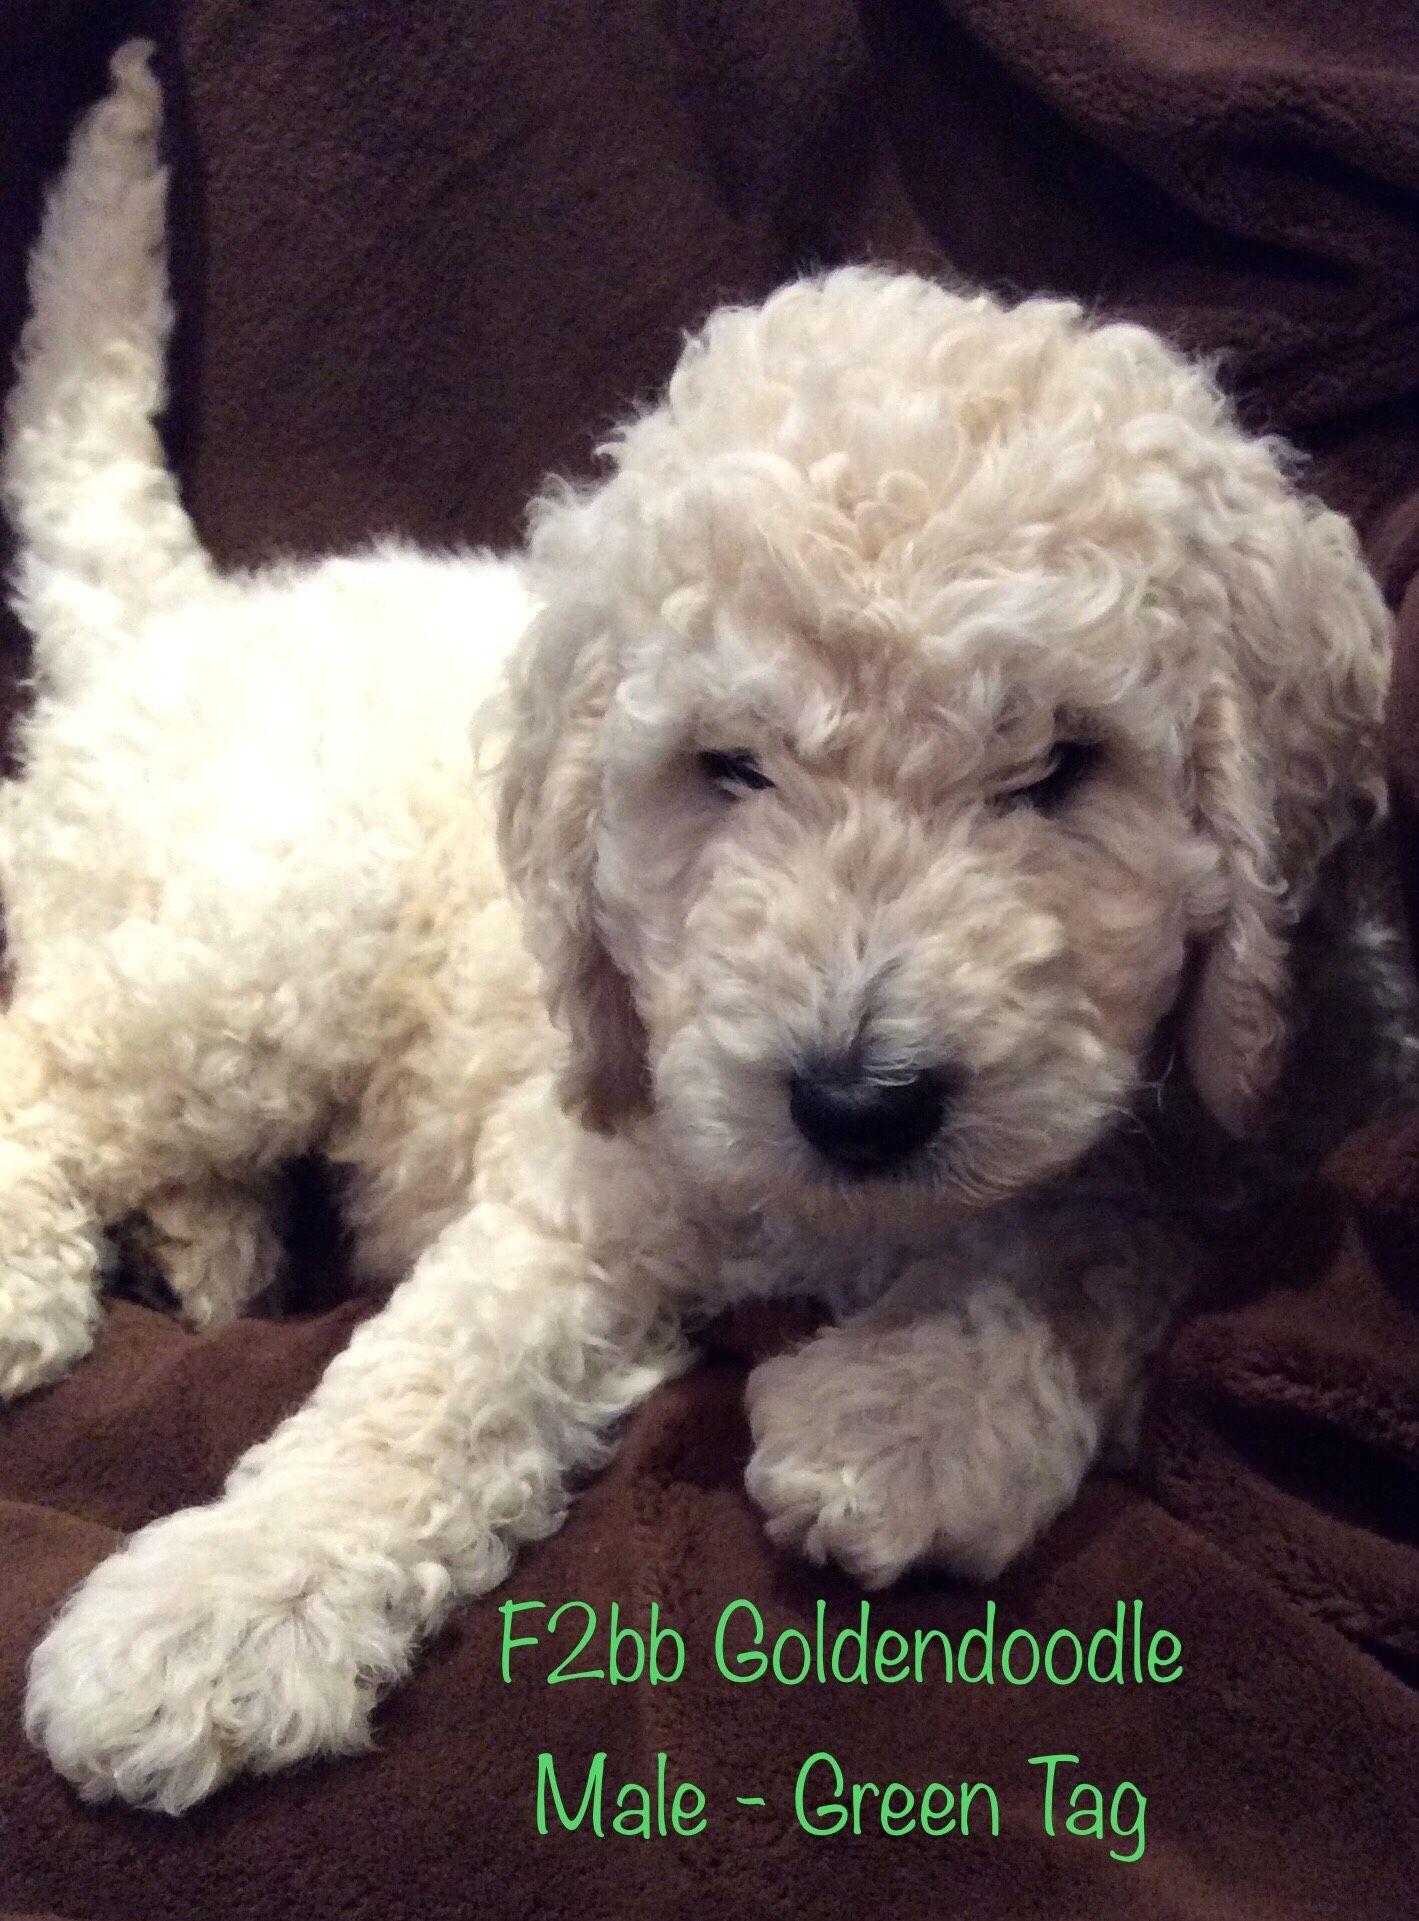 F2bb Goldendoodle Goldendoodle, Goldendoodle puppy, Puppies